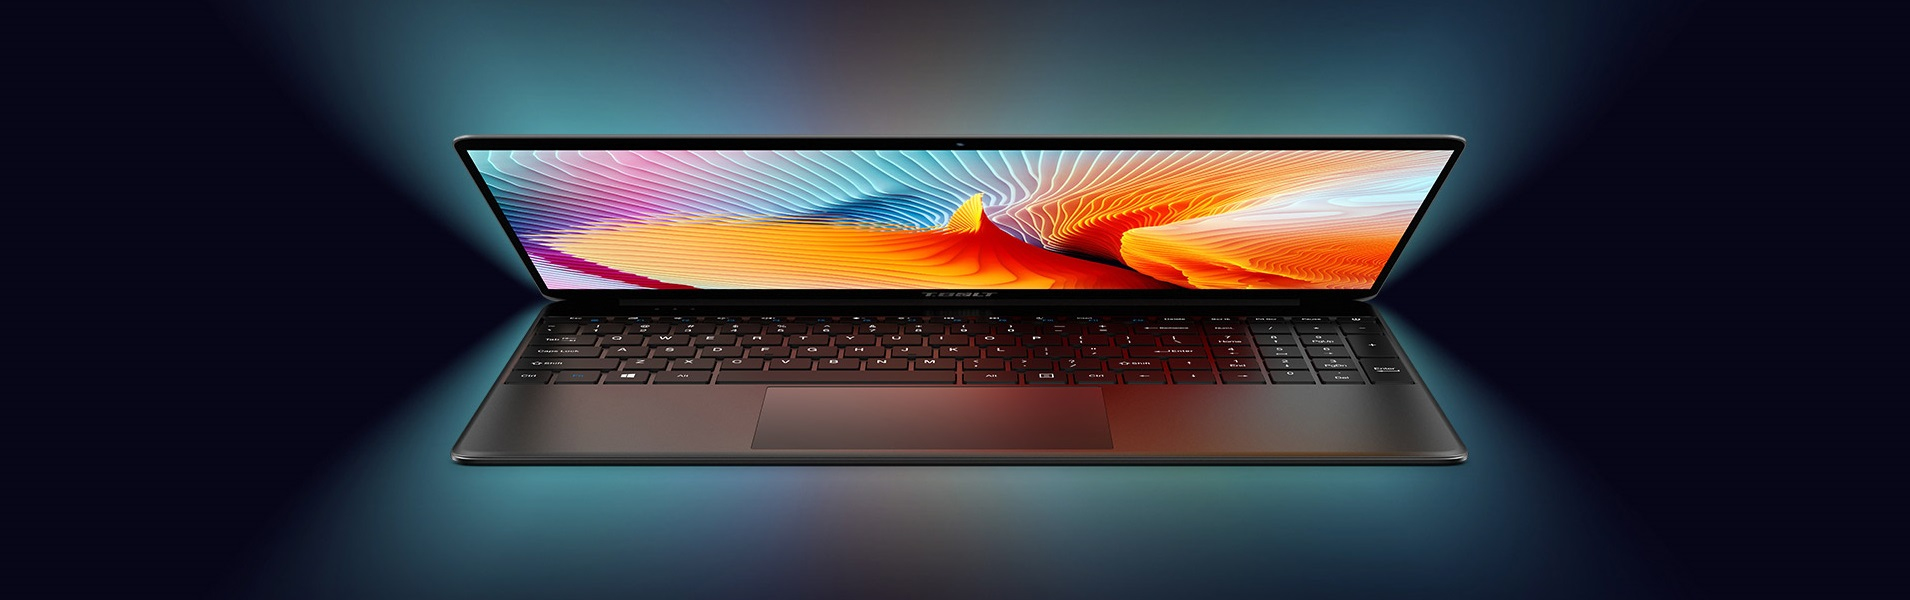 Teclast F15 Pro laptop